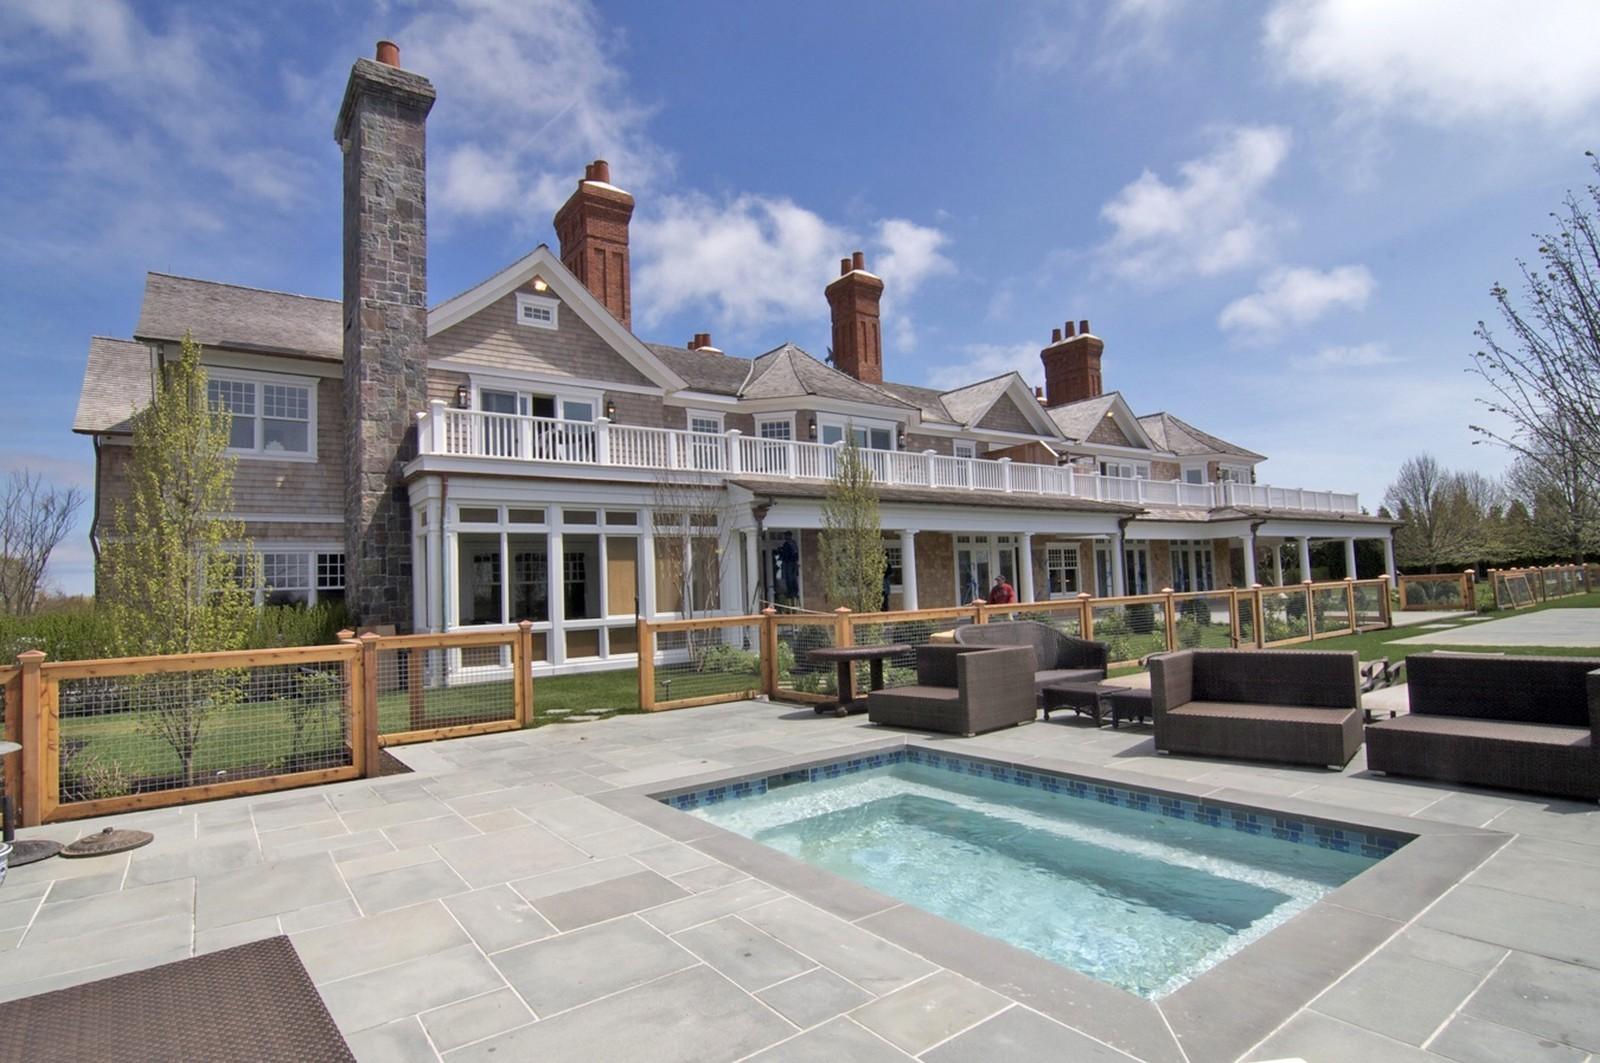 Real Estate Photography - 612 halsey lane, bridgehampton, NY, 11932 - Pool